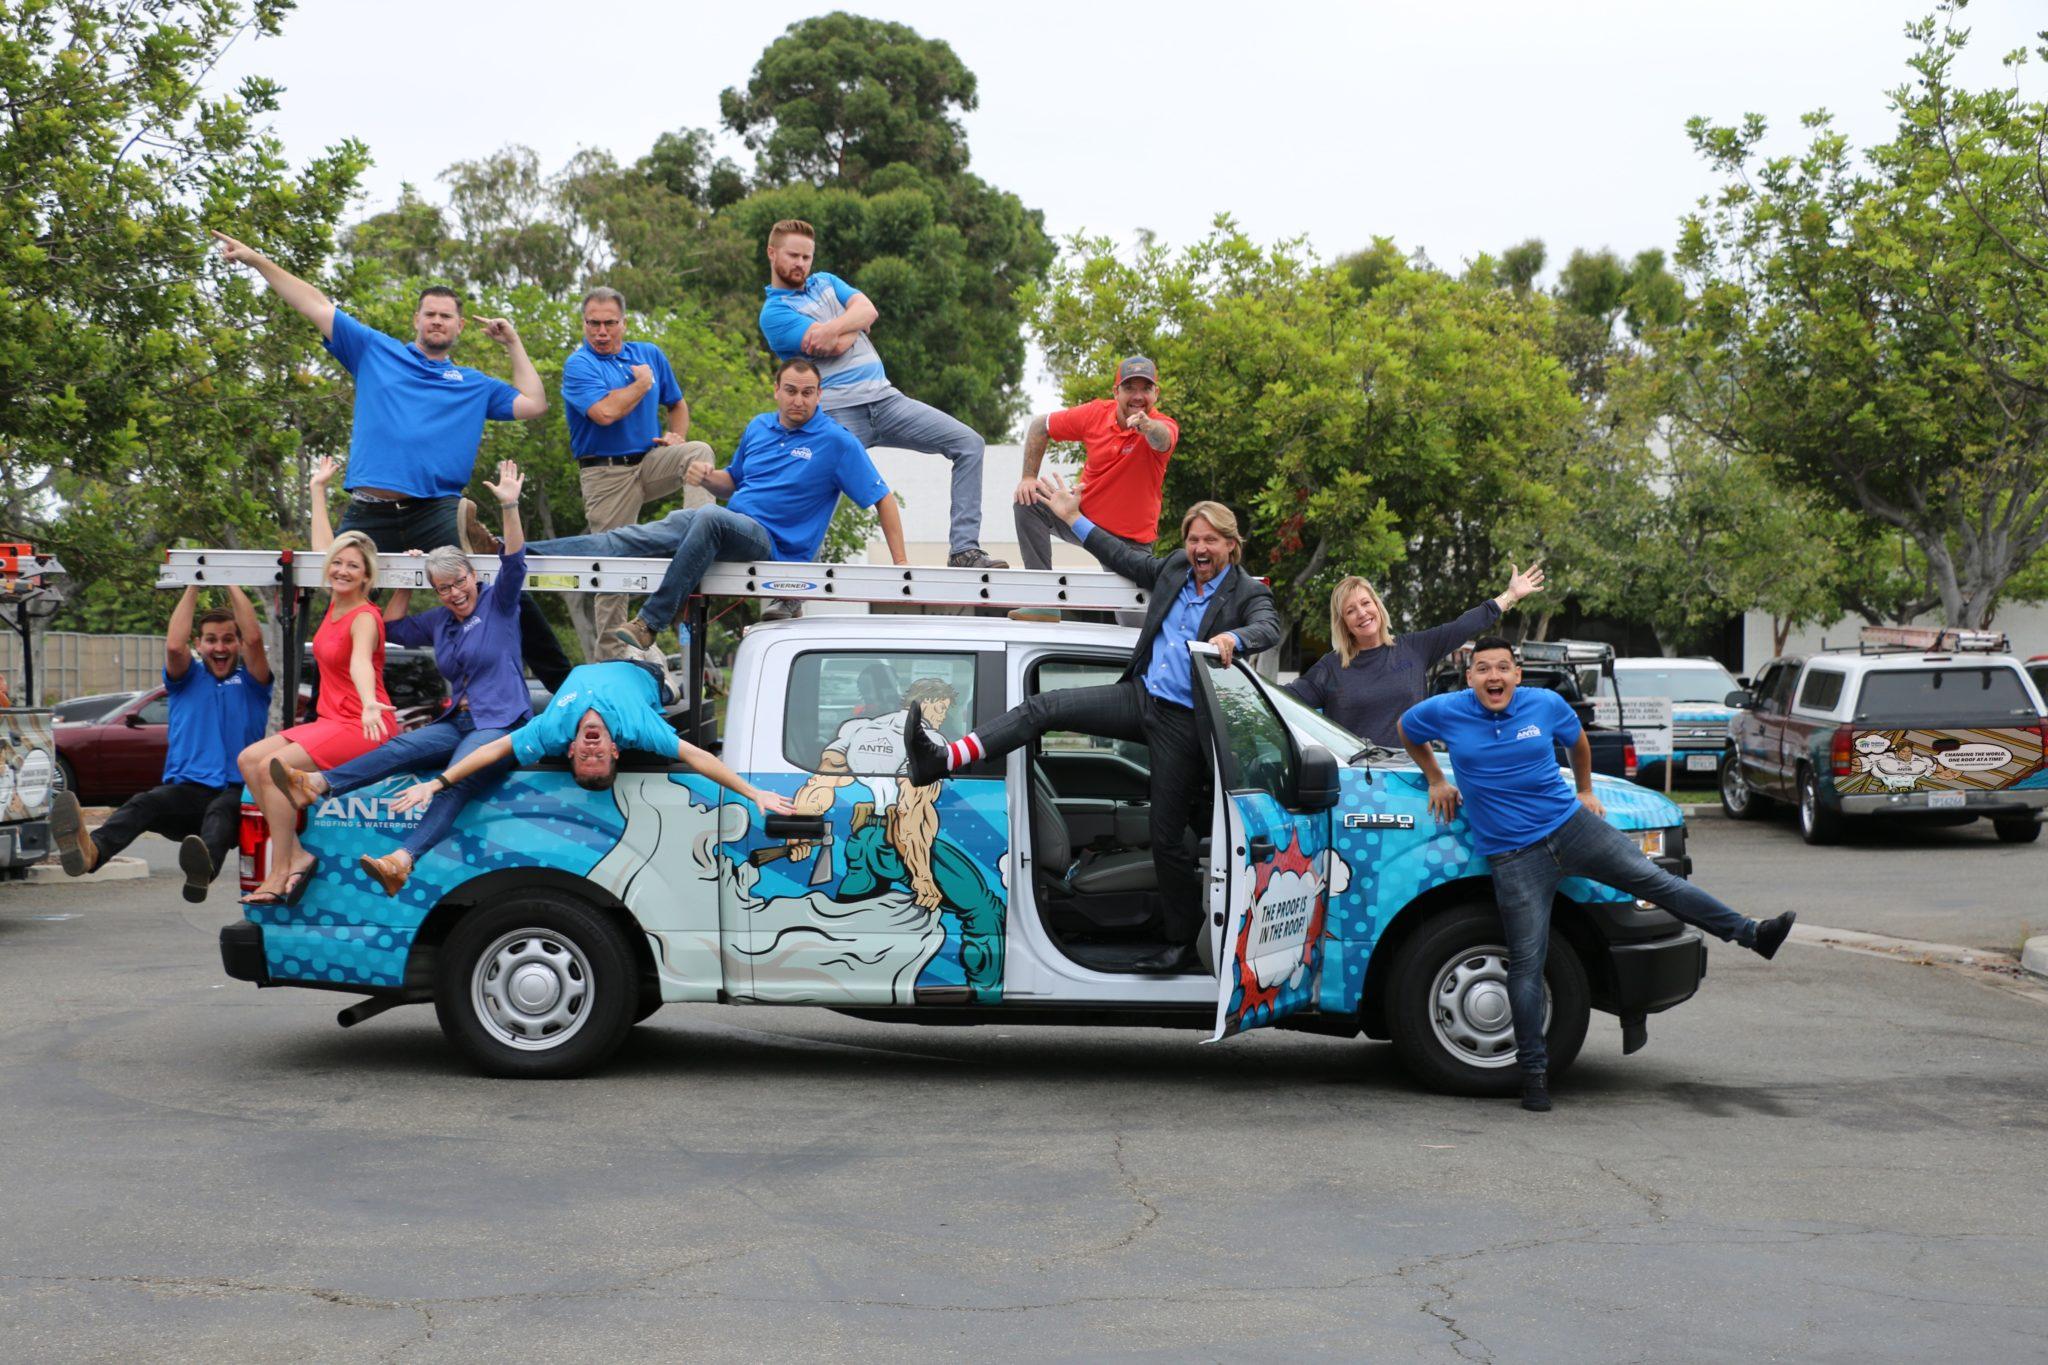 Antis Roofing & Waterproofing celebrates 30 years in business